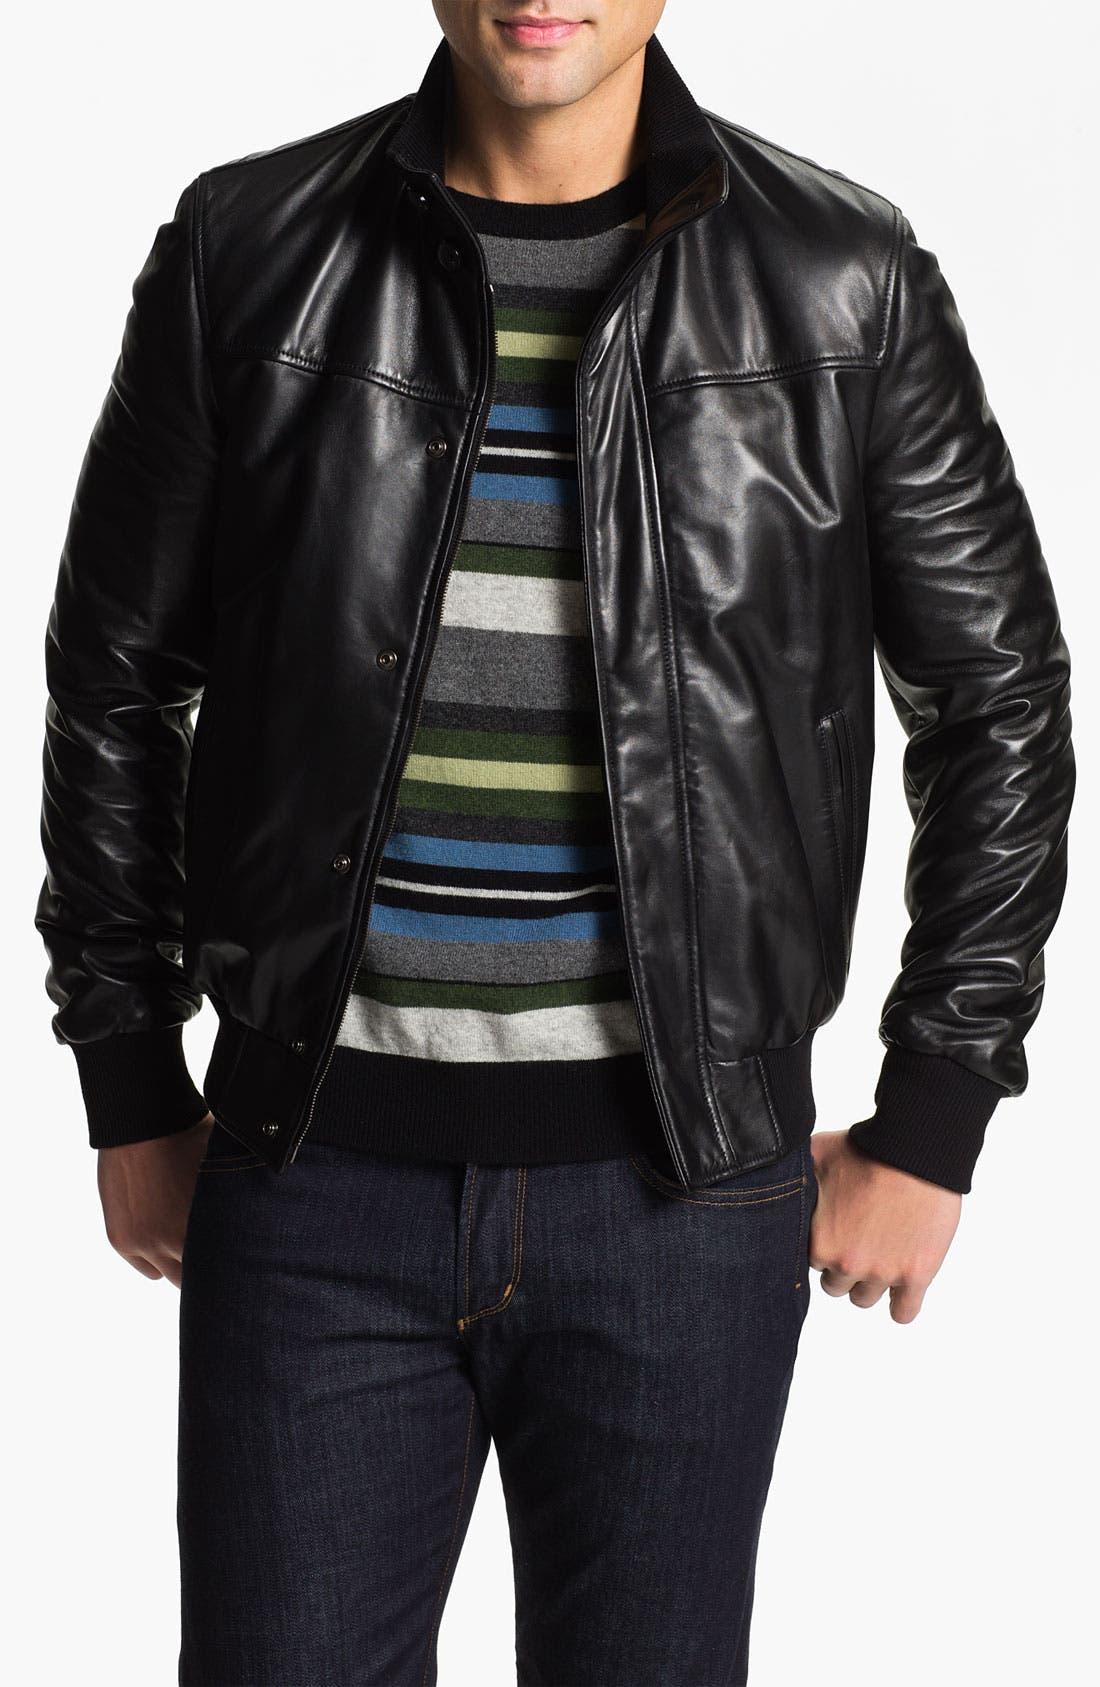 Alternate Image 1 Selected - Alex & Co. Leather Bomber Jacket